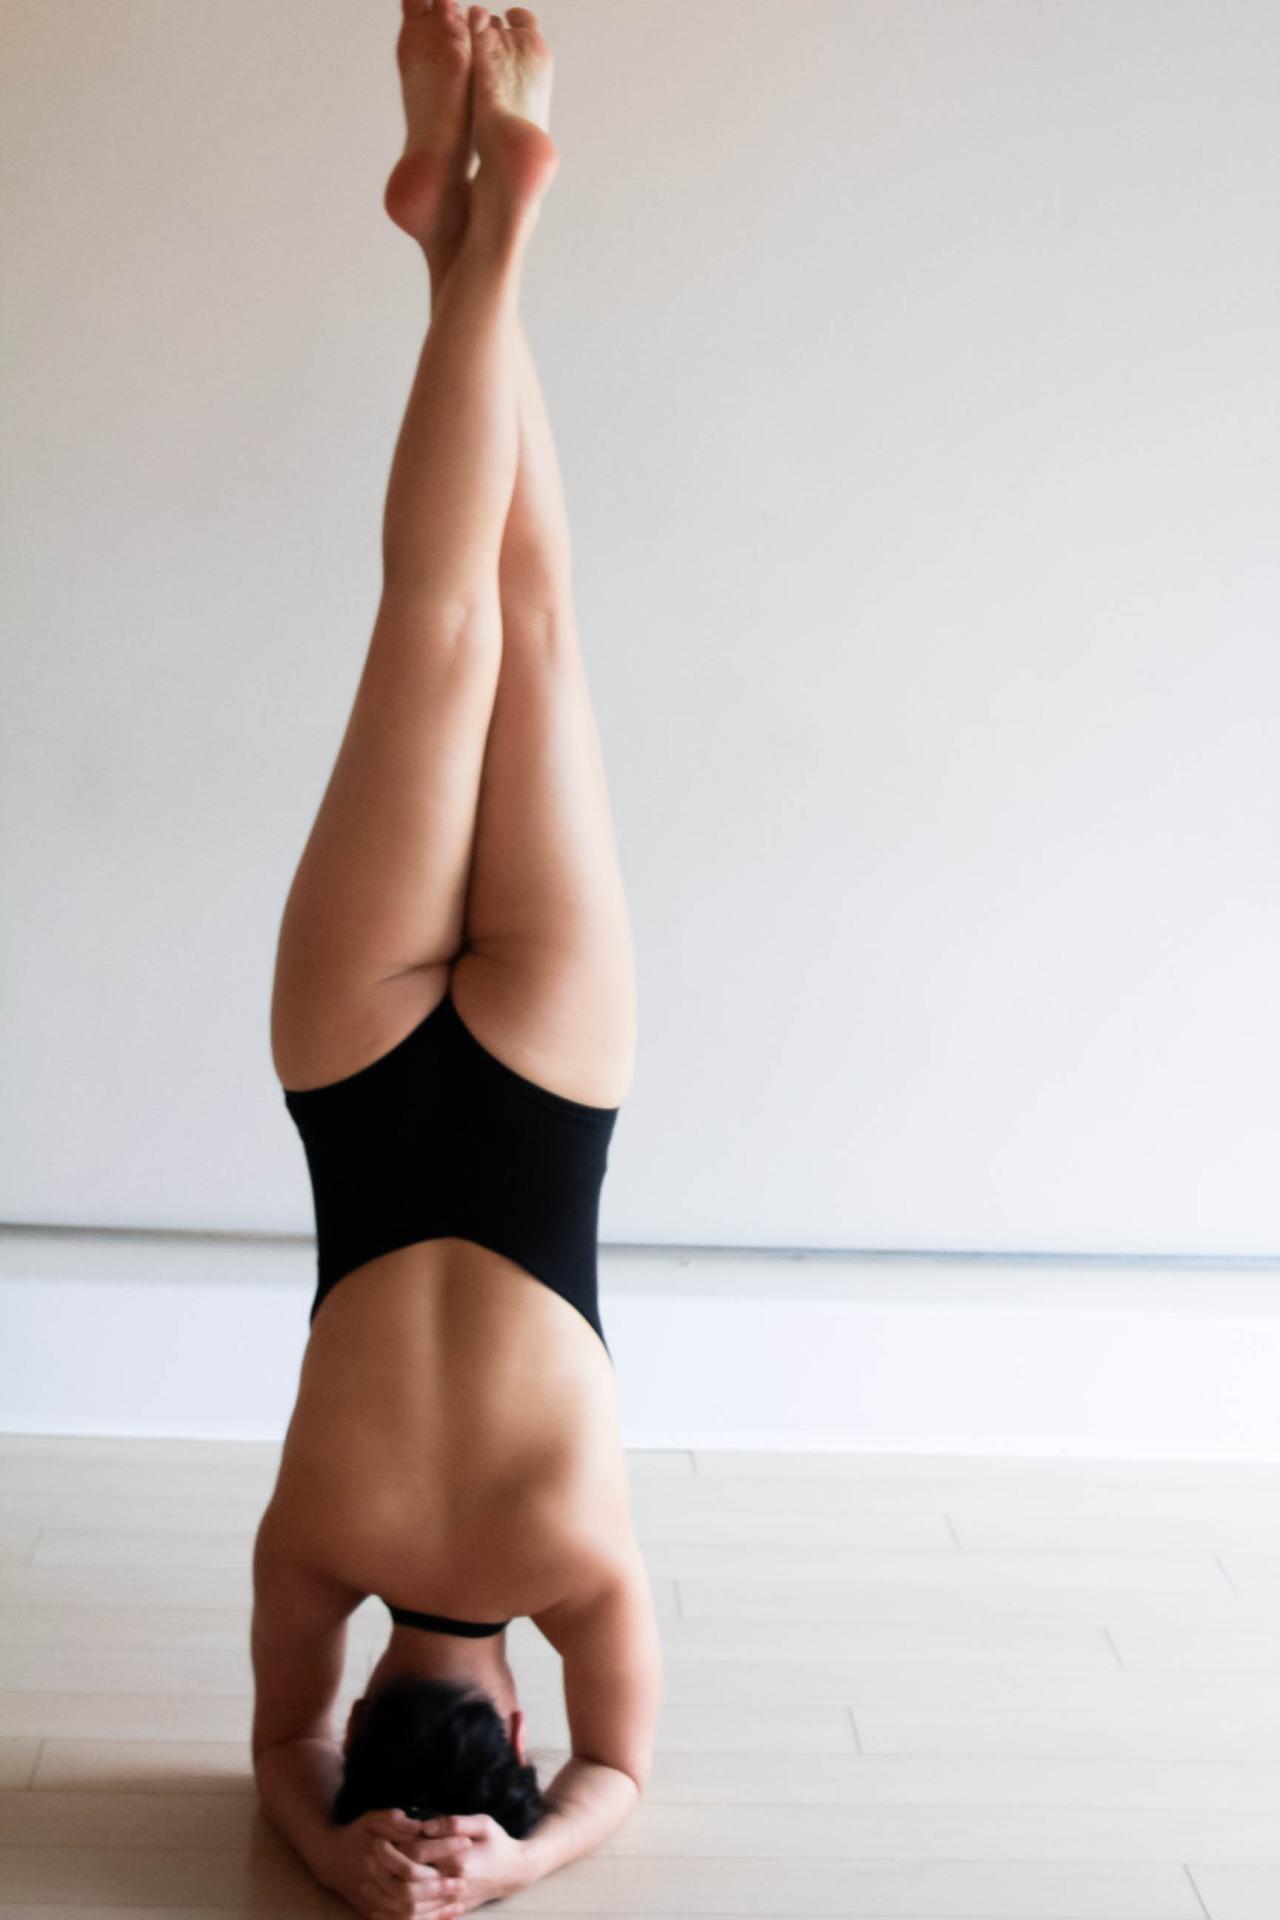 sirsasana - headstand